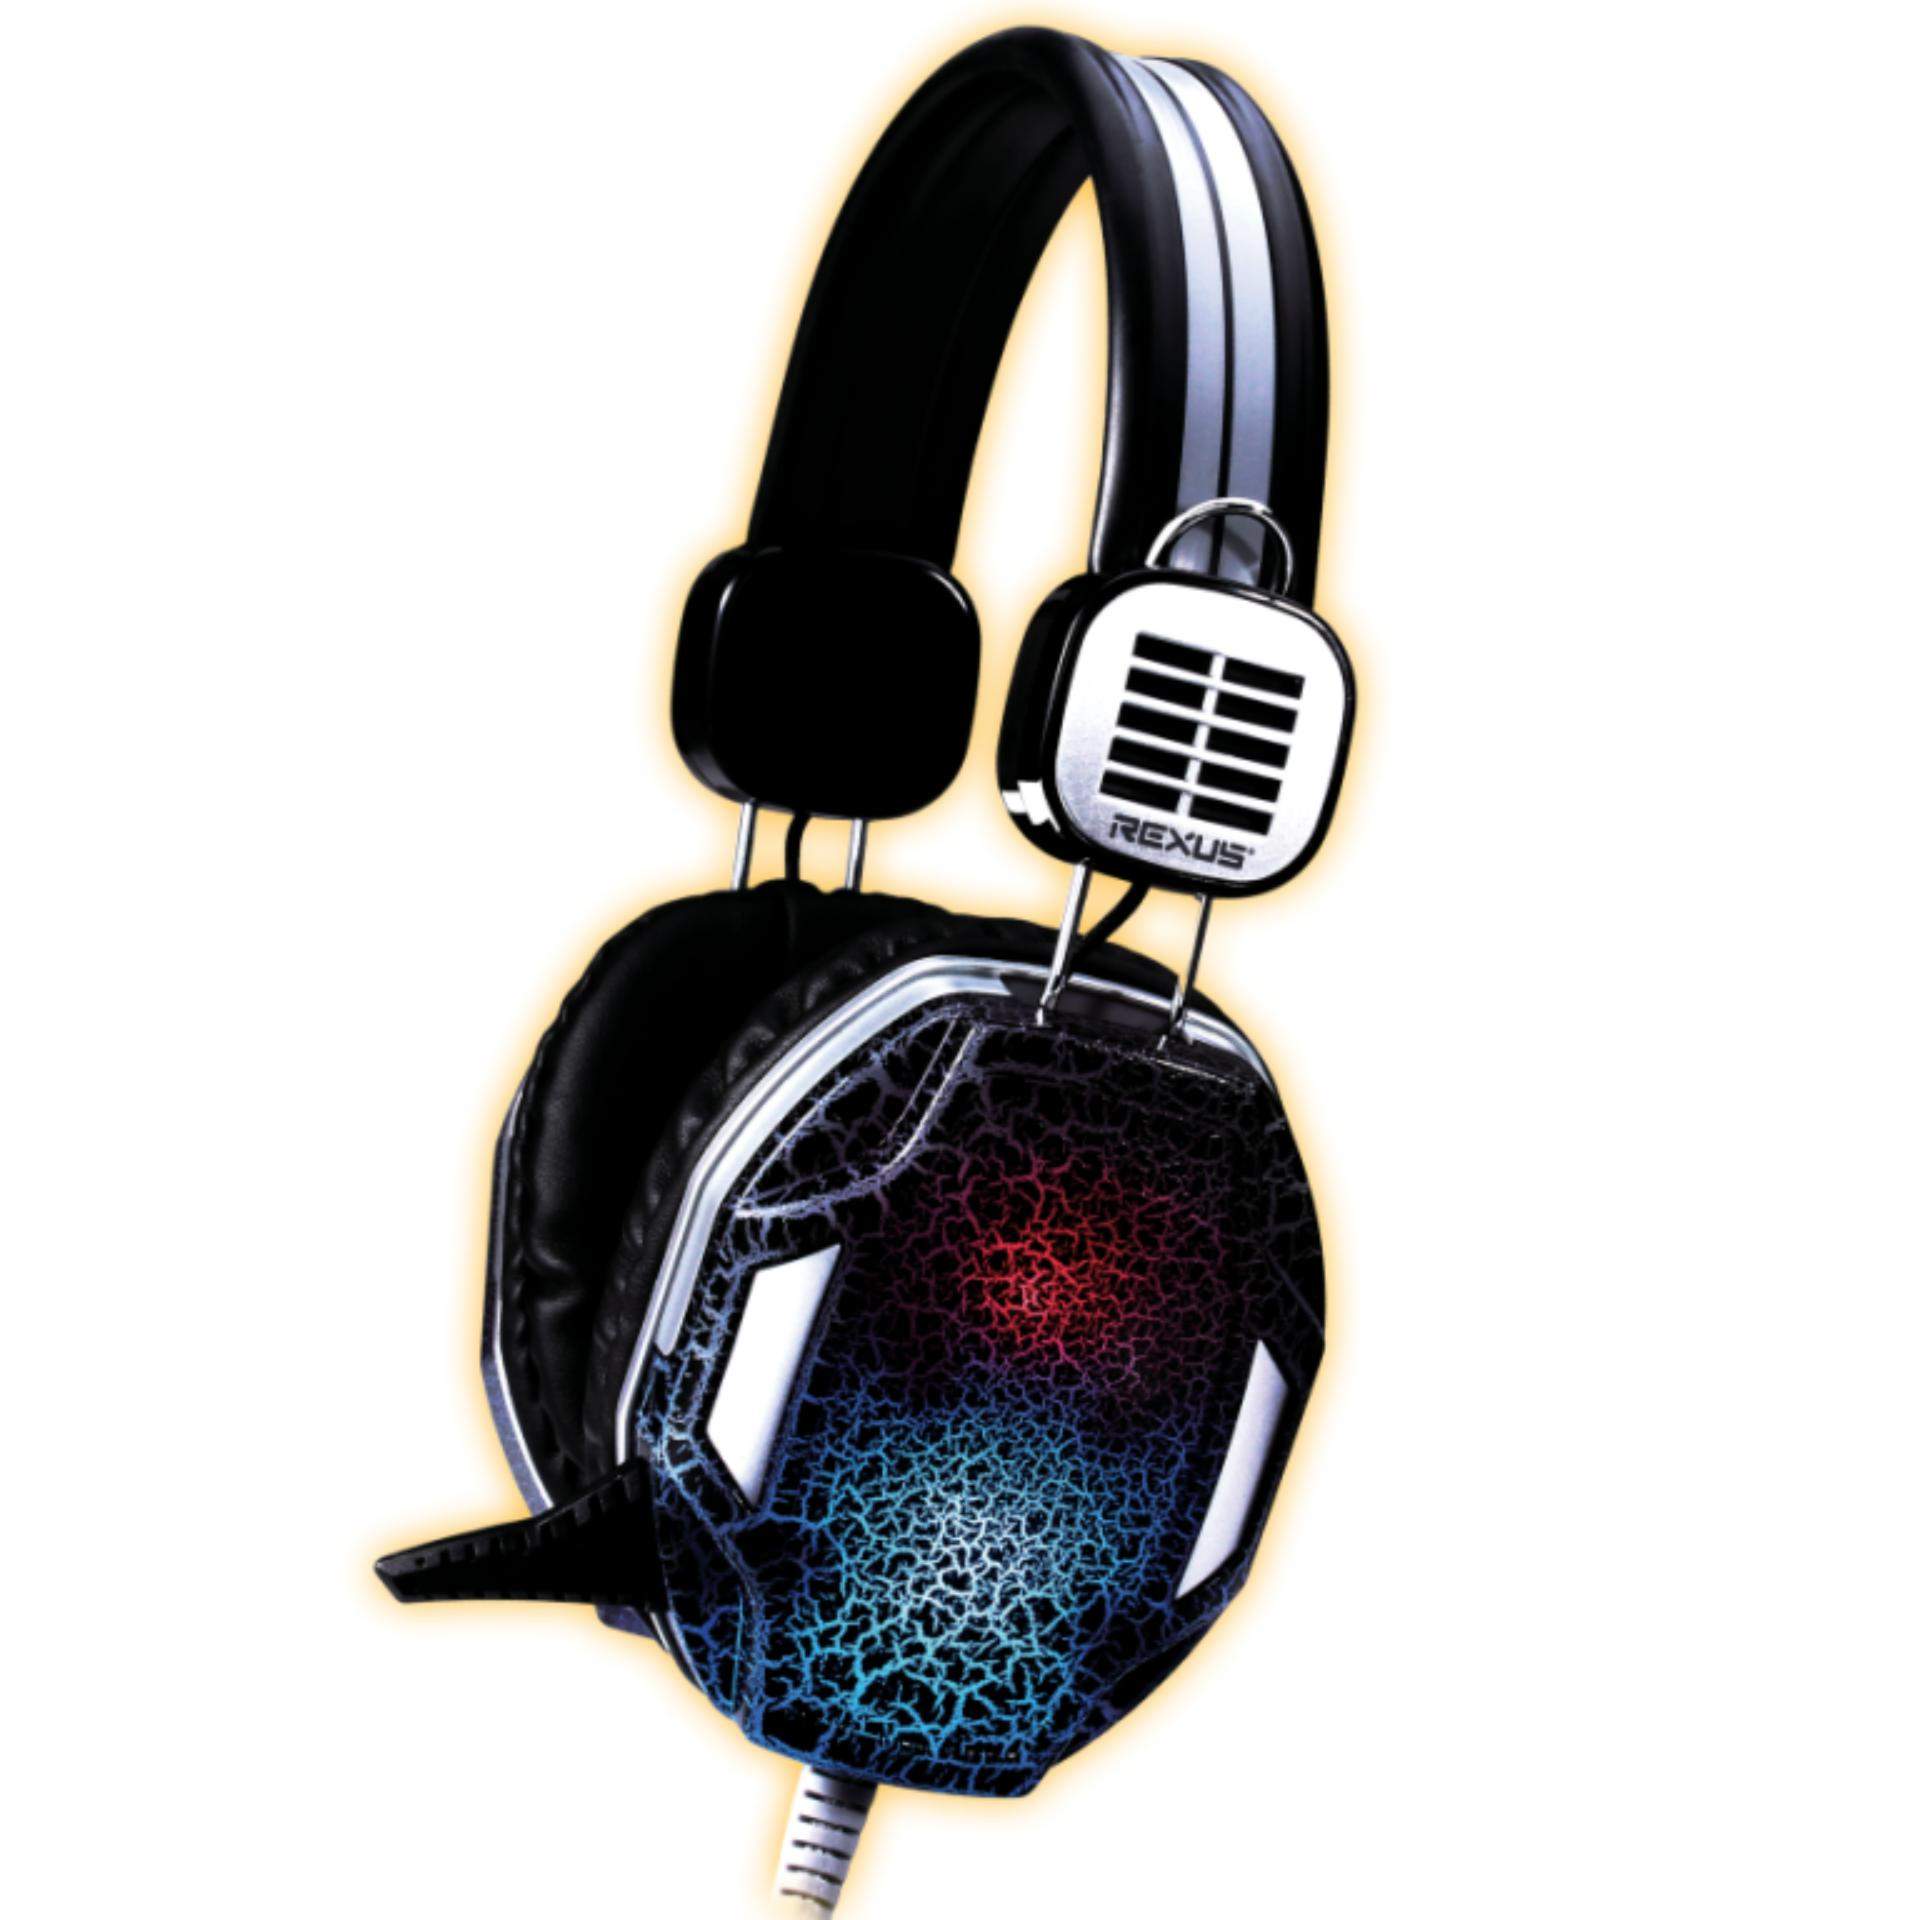 Pencarian Termurah Rexus Headset Gaming F17 F 17 Vonix F26 Hitam Headphone Head Set Earphone Black